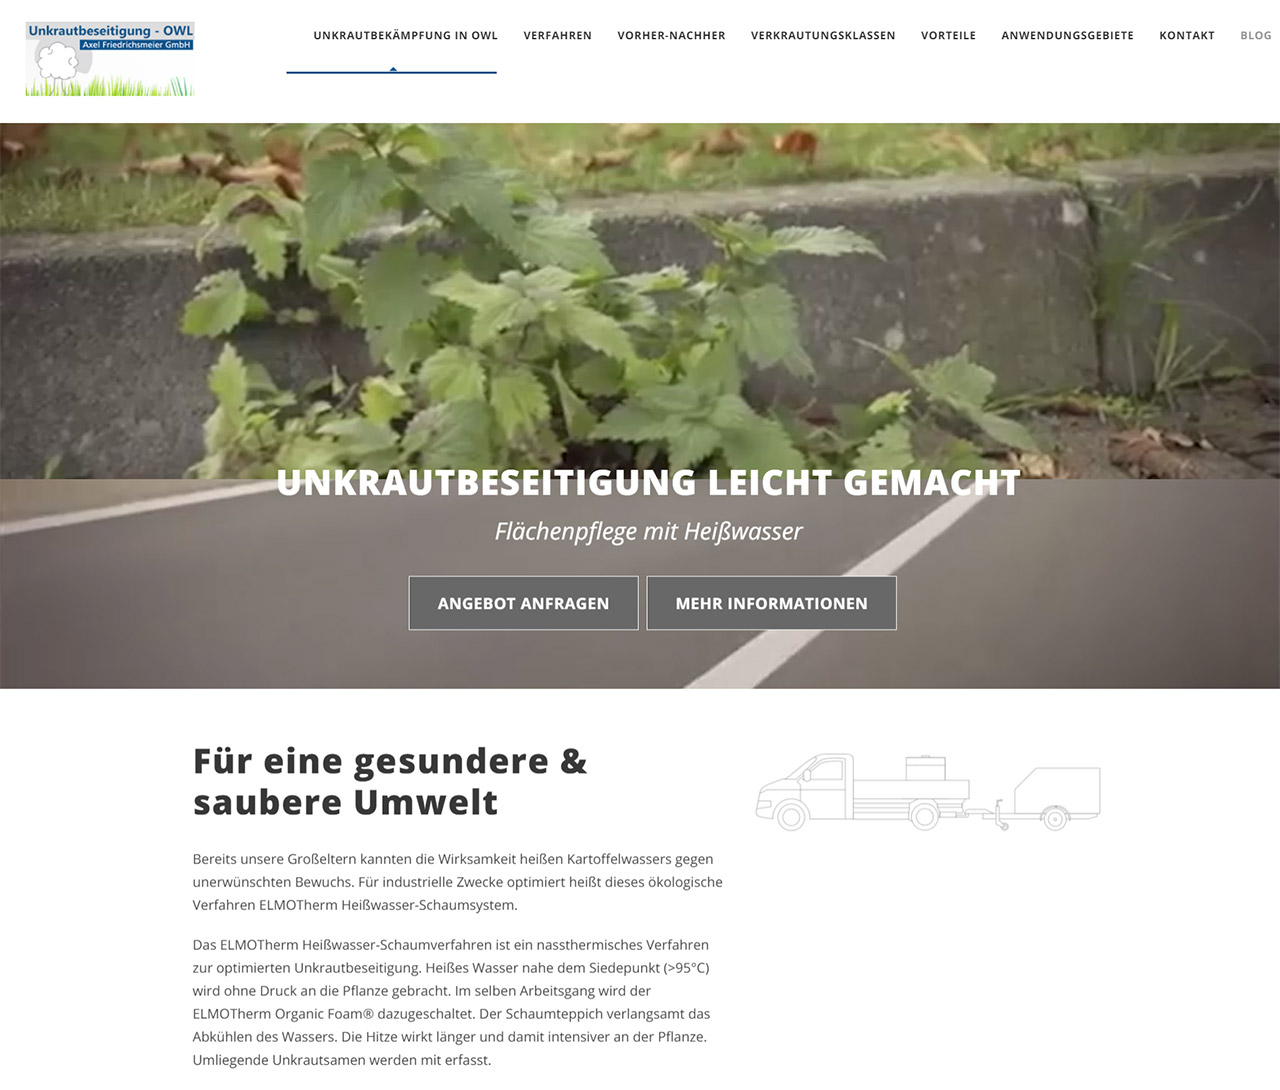 Unkrautbeseitigung - OWL / Axel Friedrichsmeier GmbH